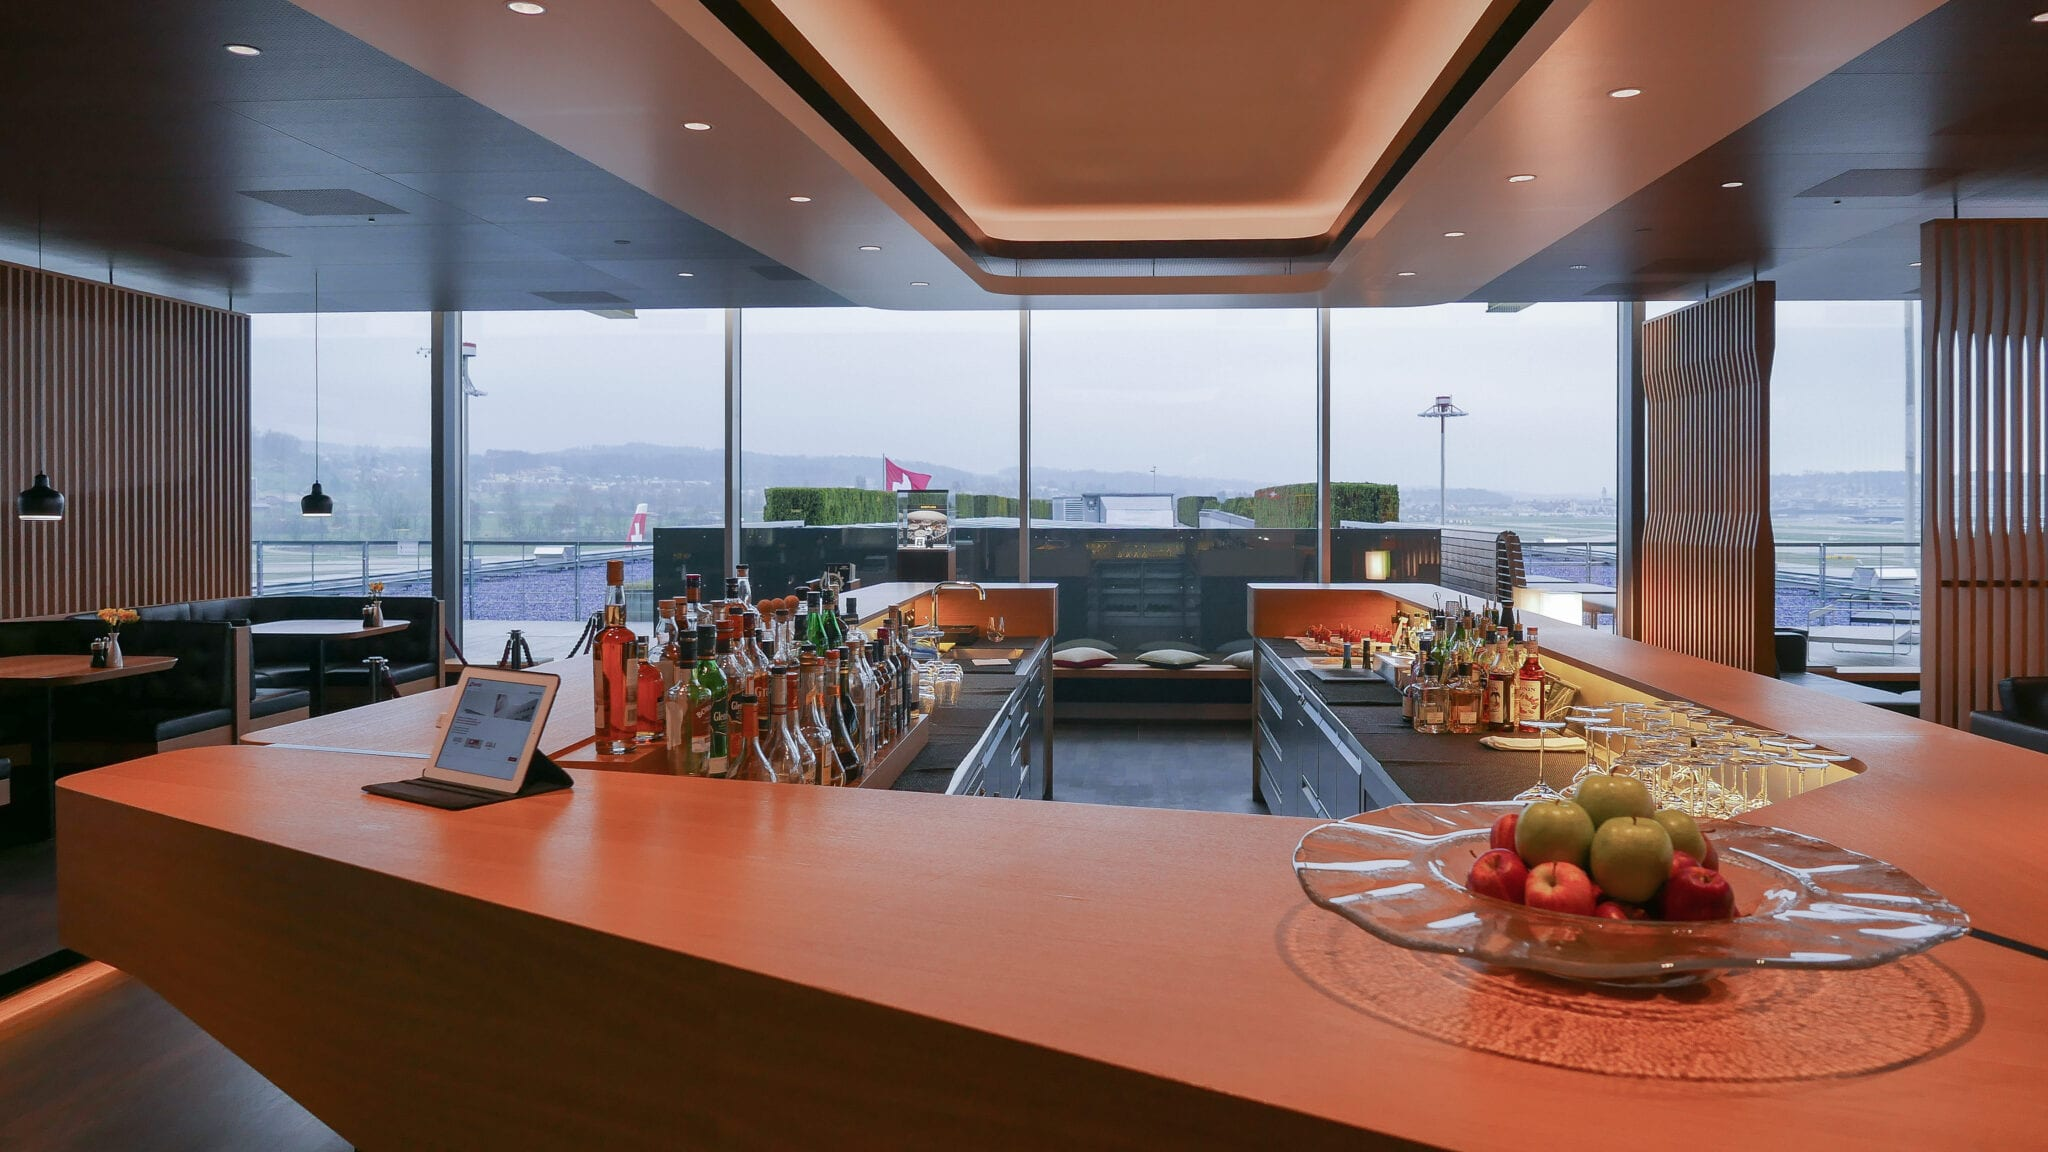 LX F ZRH E gates 10 - REVIEW - SWISS First Class Lounge - Zurich (ZRH E-Gates)